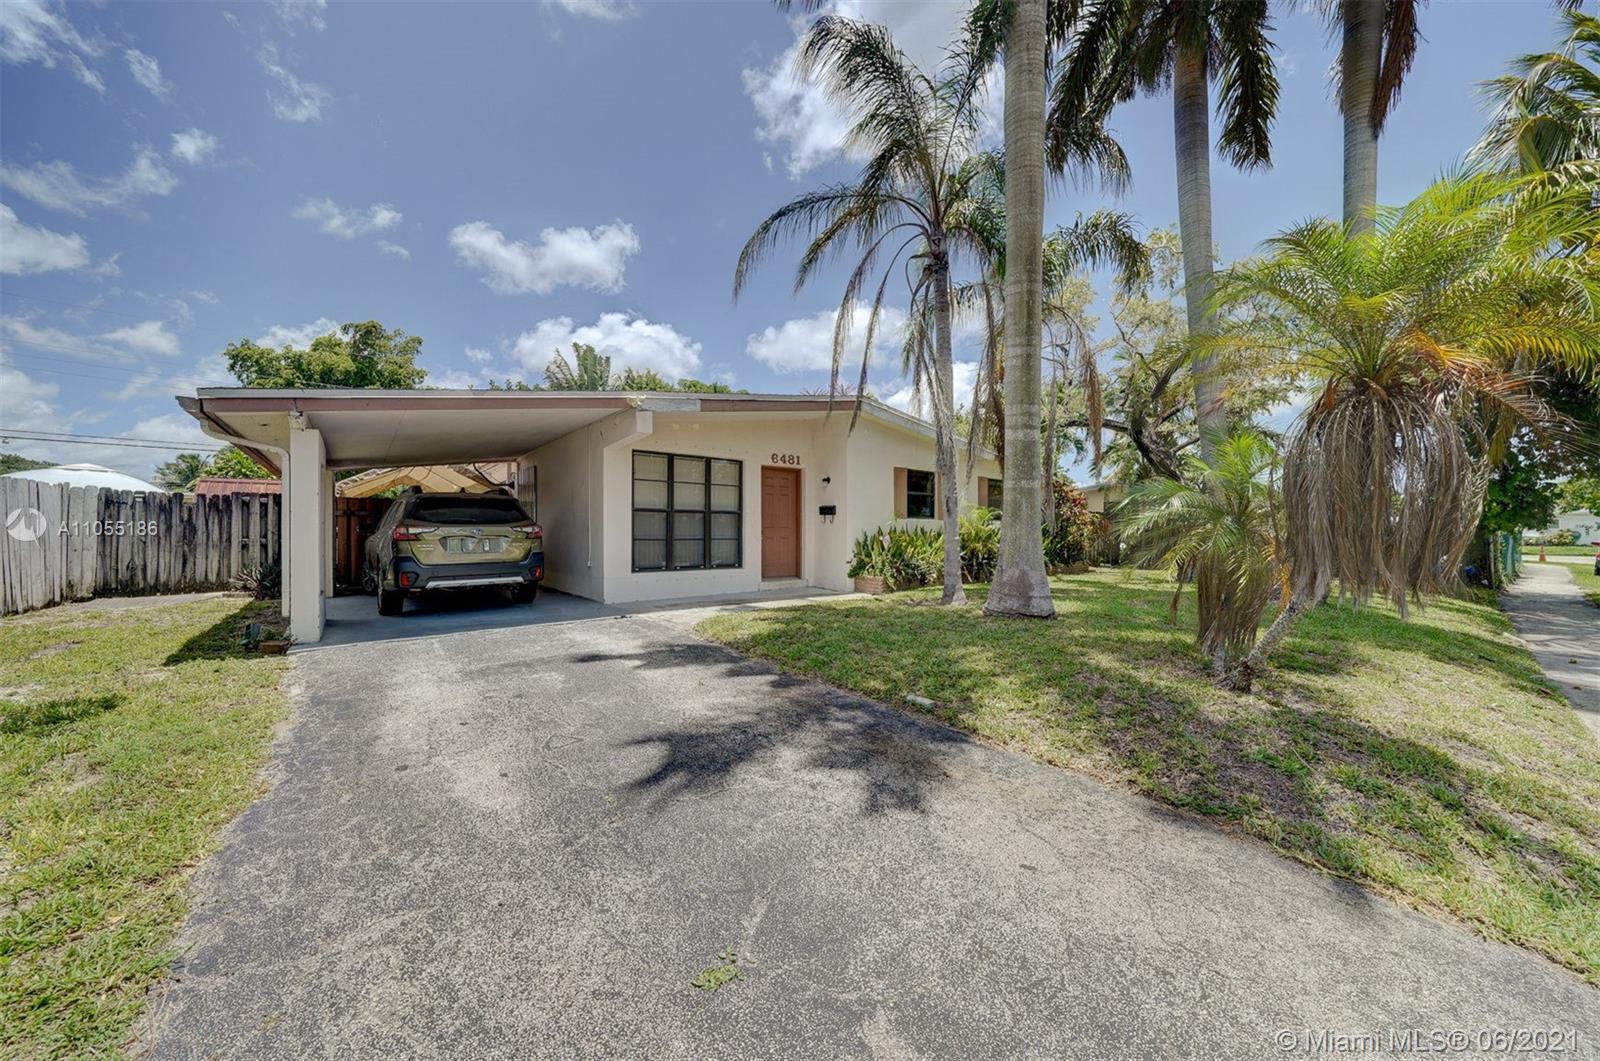 Boulevard Heights - 6481 SW 6th St, Pembroke Pines, FL 33023